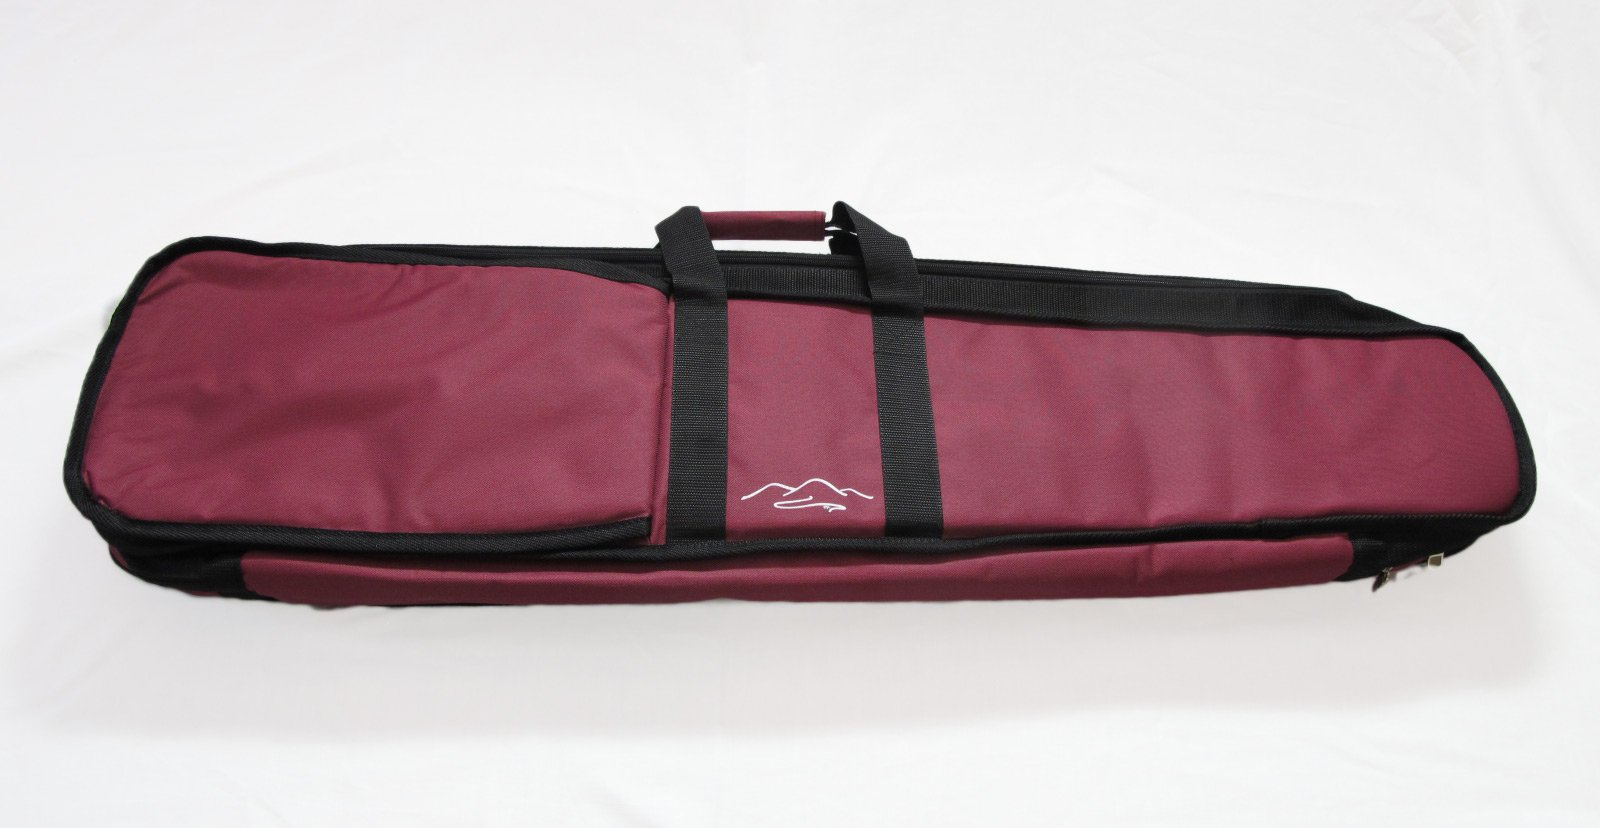 TK O'Brien's Mountain Dulcimer Carrying Case (Burgundy)